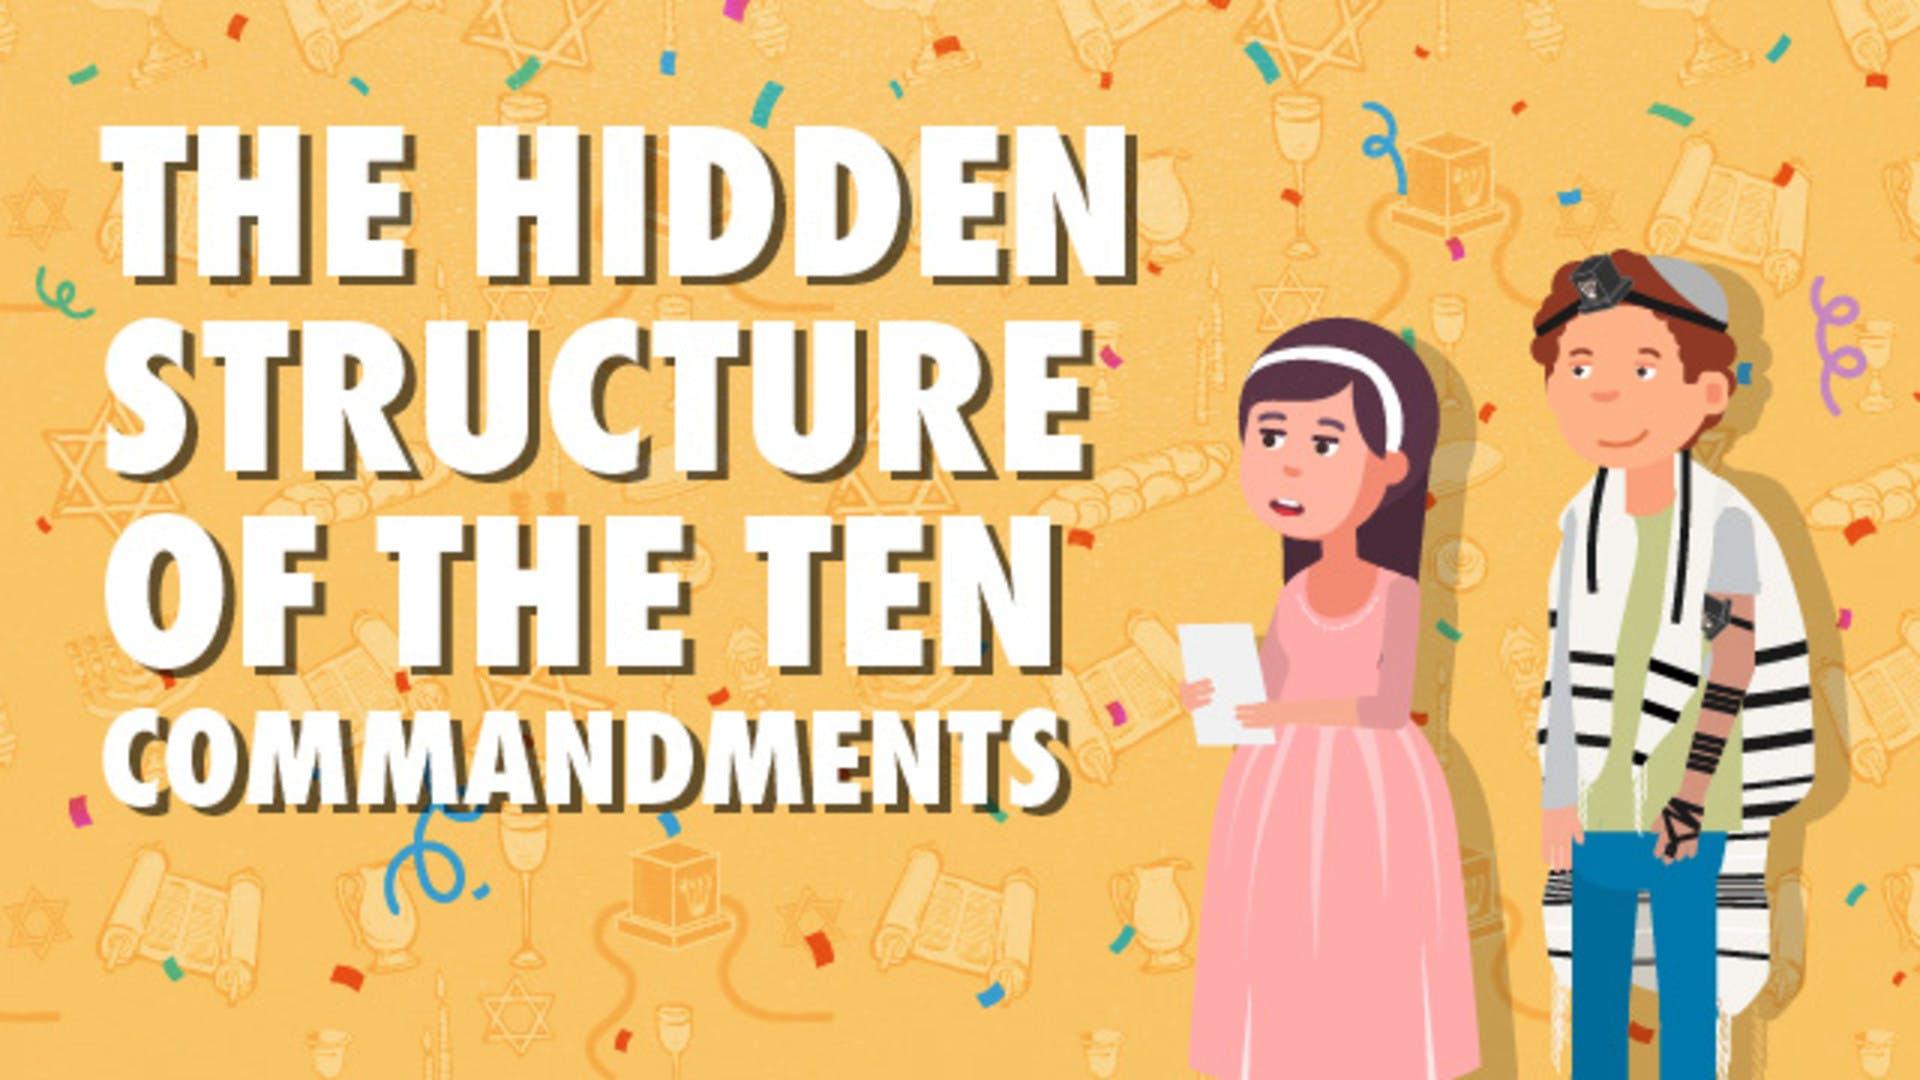 The Hidden Structure of the Ten Commandments